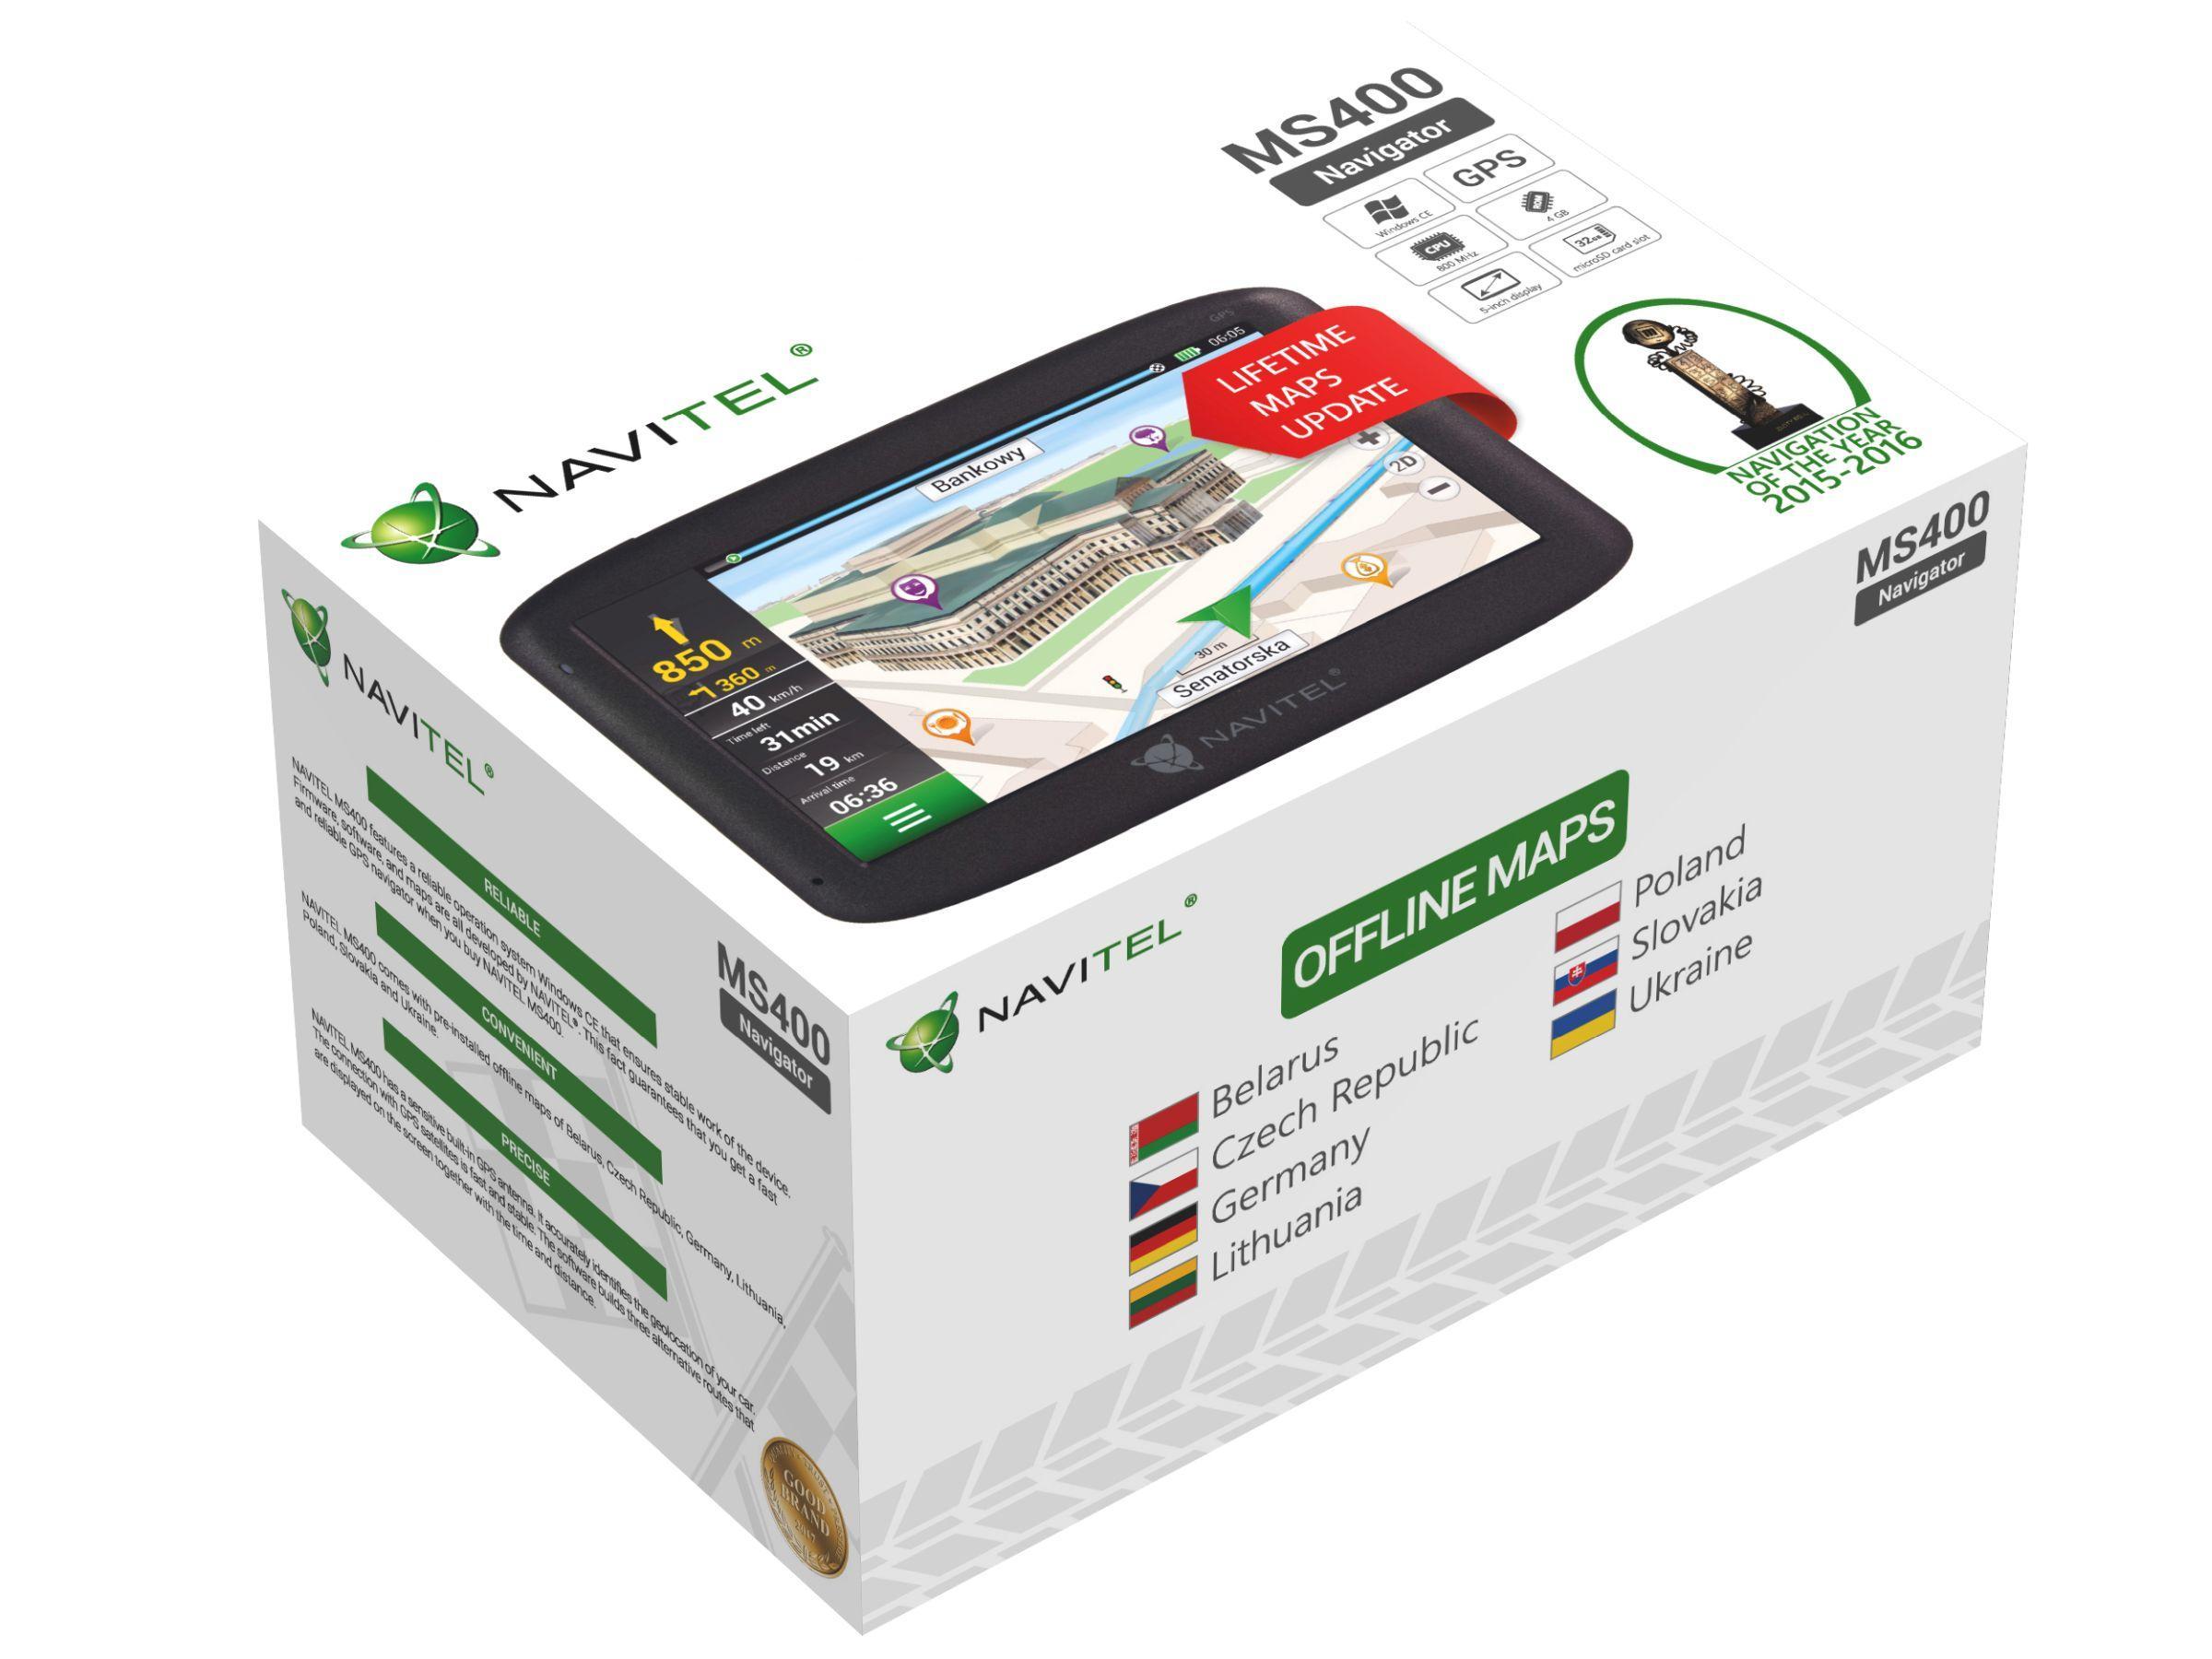 Navigationssystem NAVITEL NAVMS400 Expertkunskap